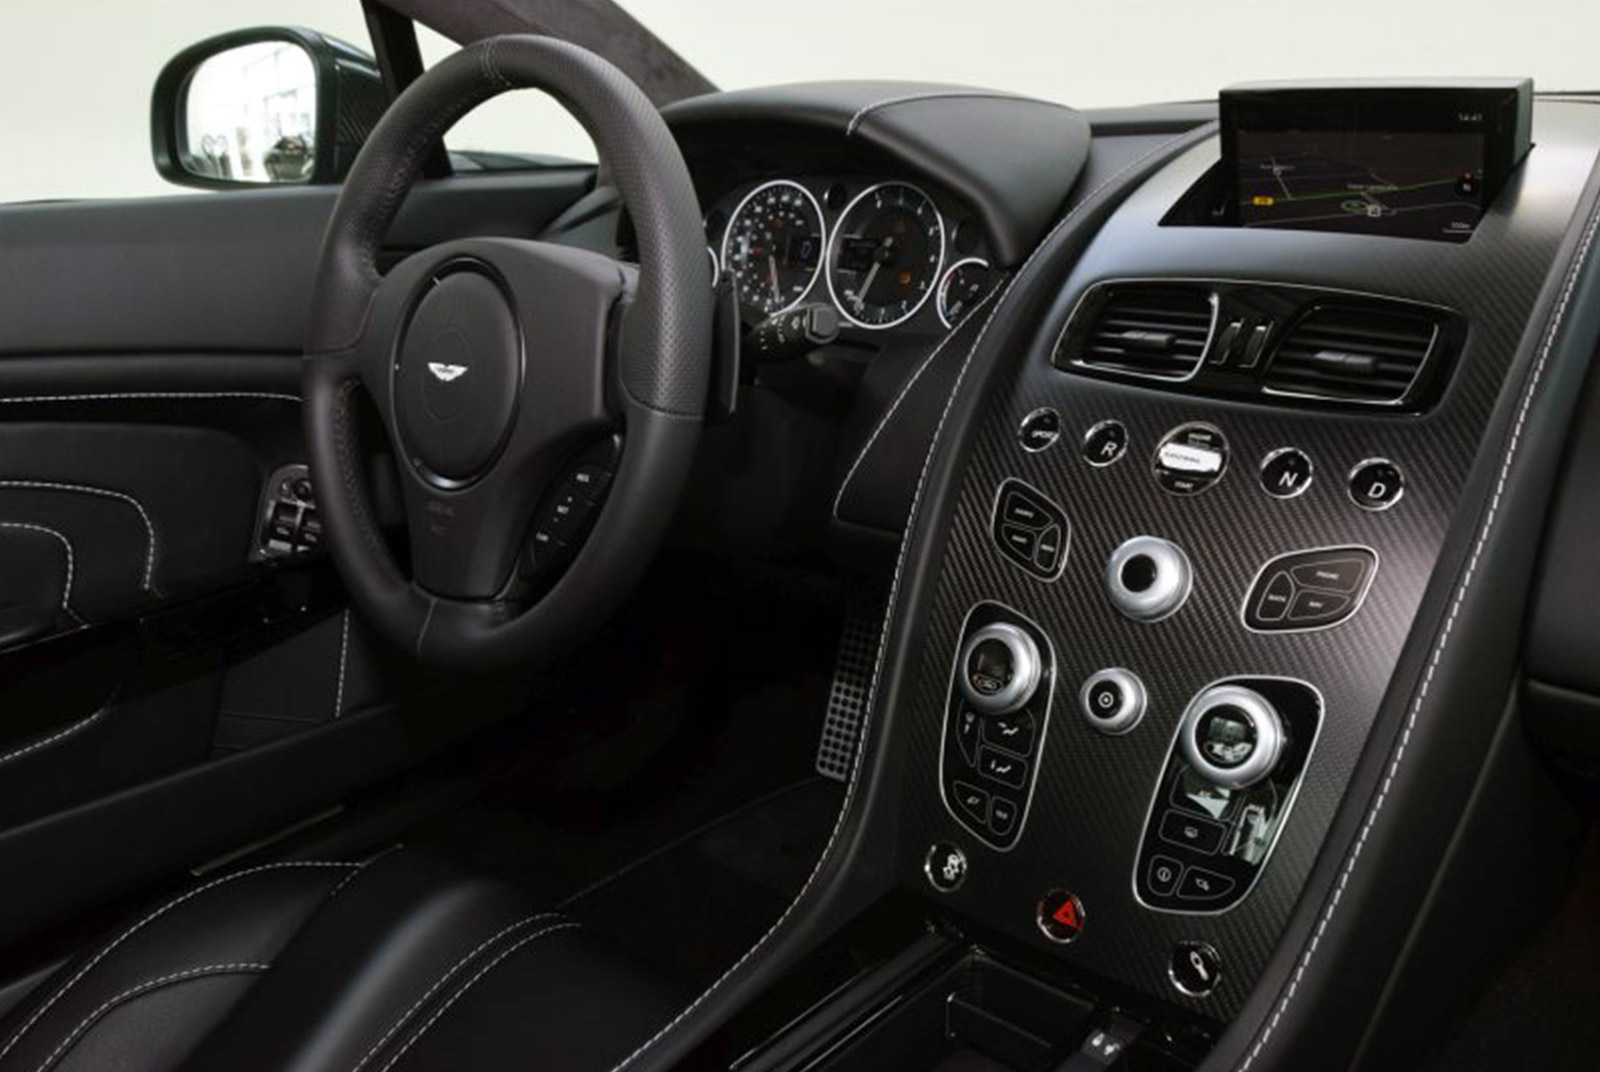 AM-2995-Aston-Martin_V12-Vantage-S_Grau_Schwarz_20